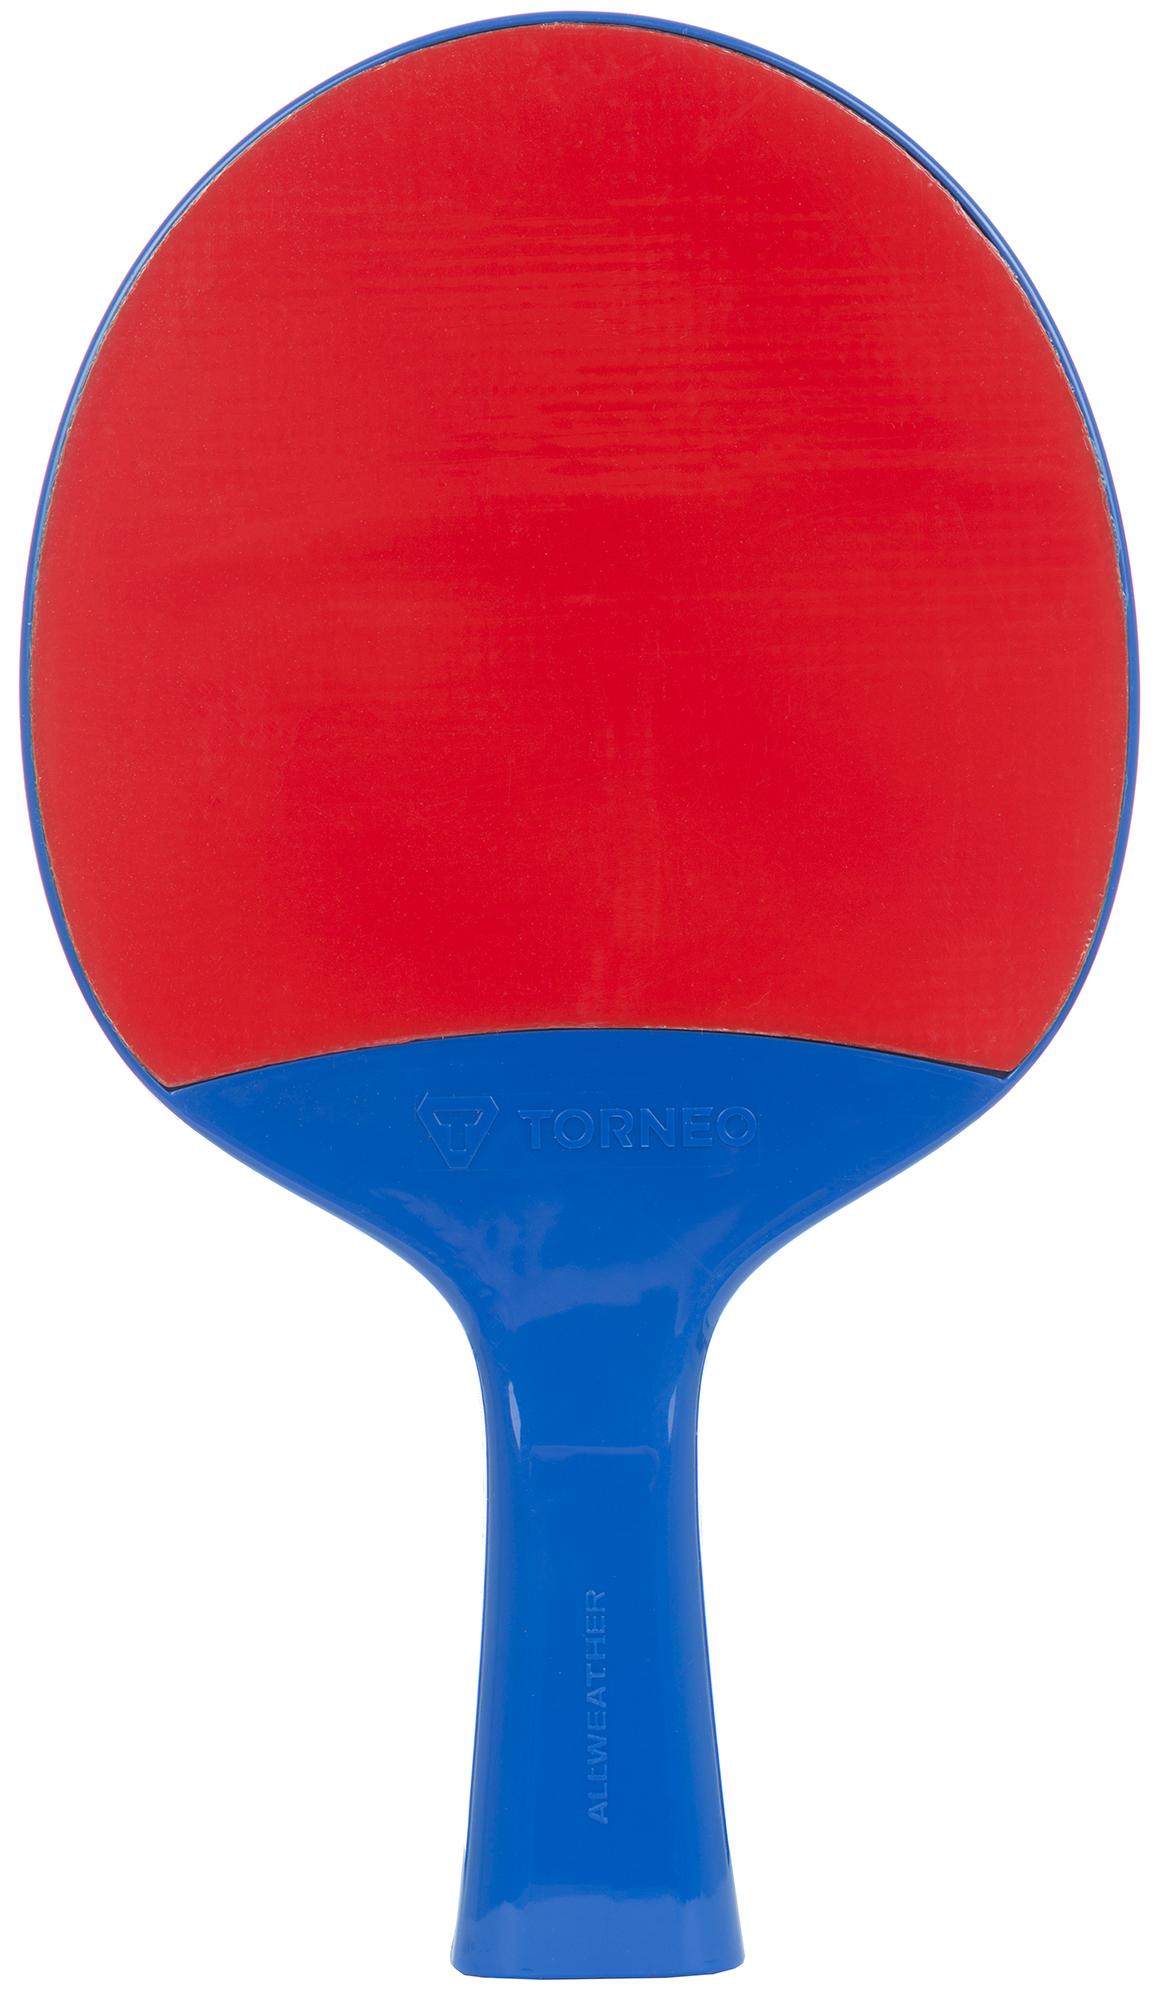 Torneo Ракетка для настольного тенниса Torneo Plastic Beginner цена